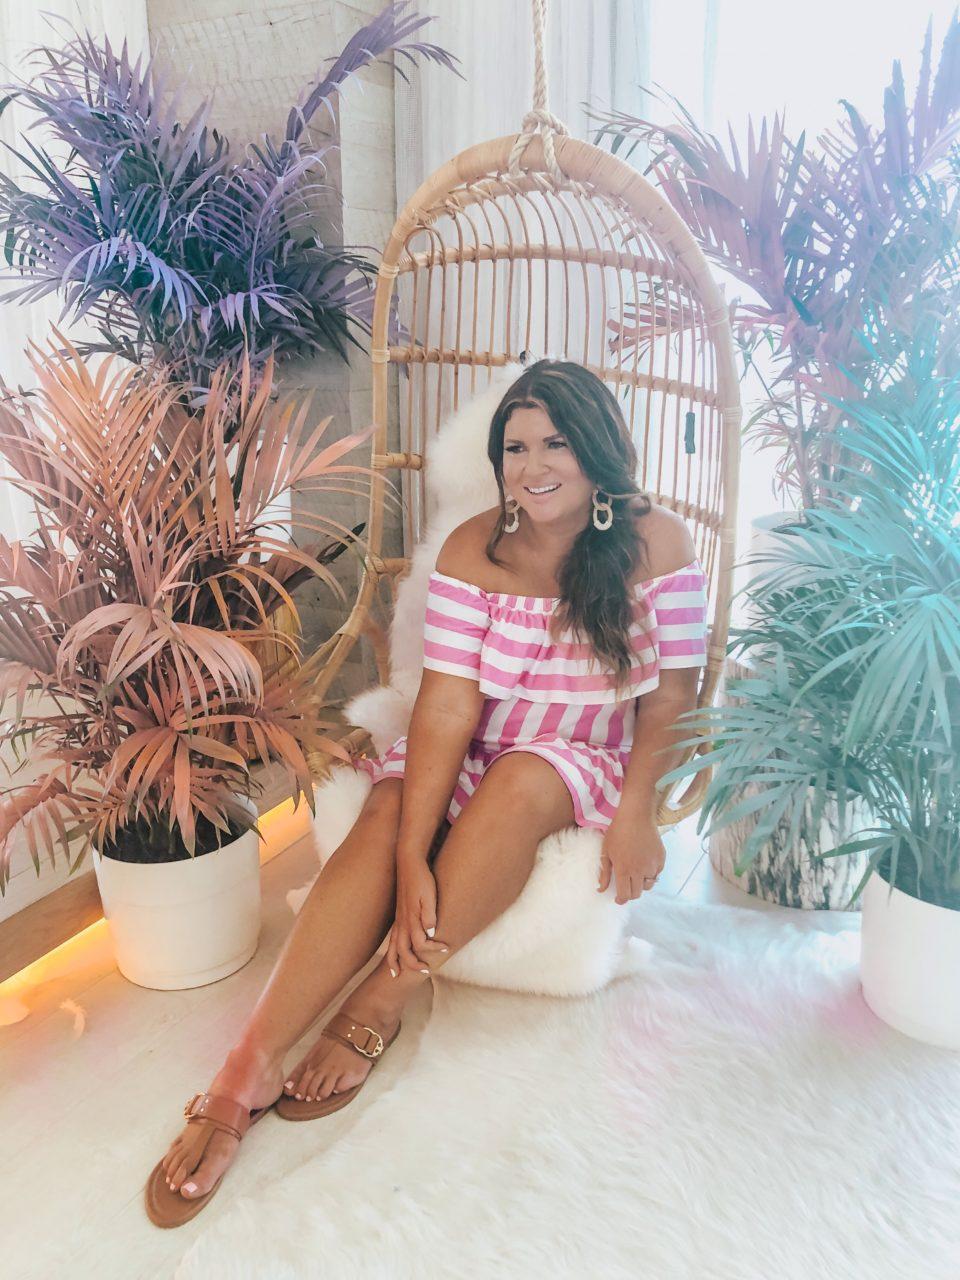 Miami Swim Week - Jami Ray at Bollare Hub